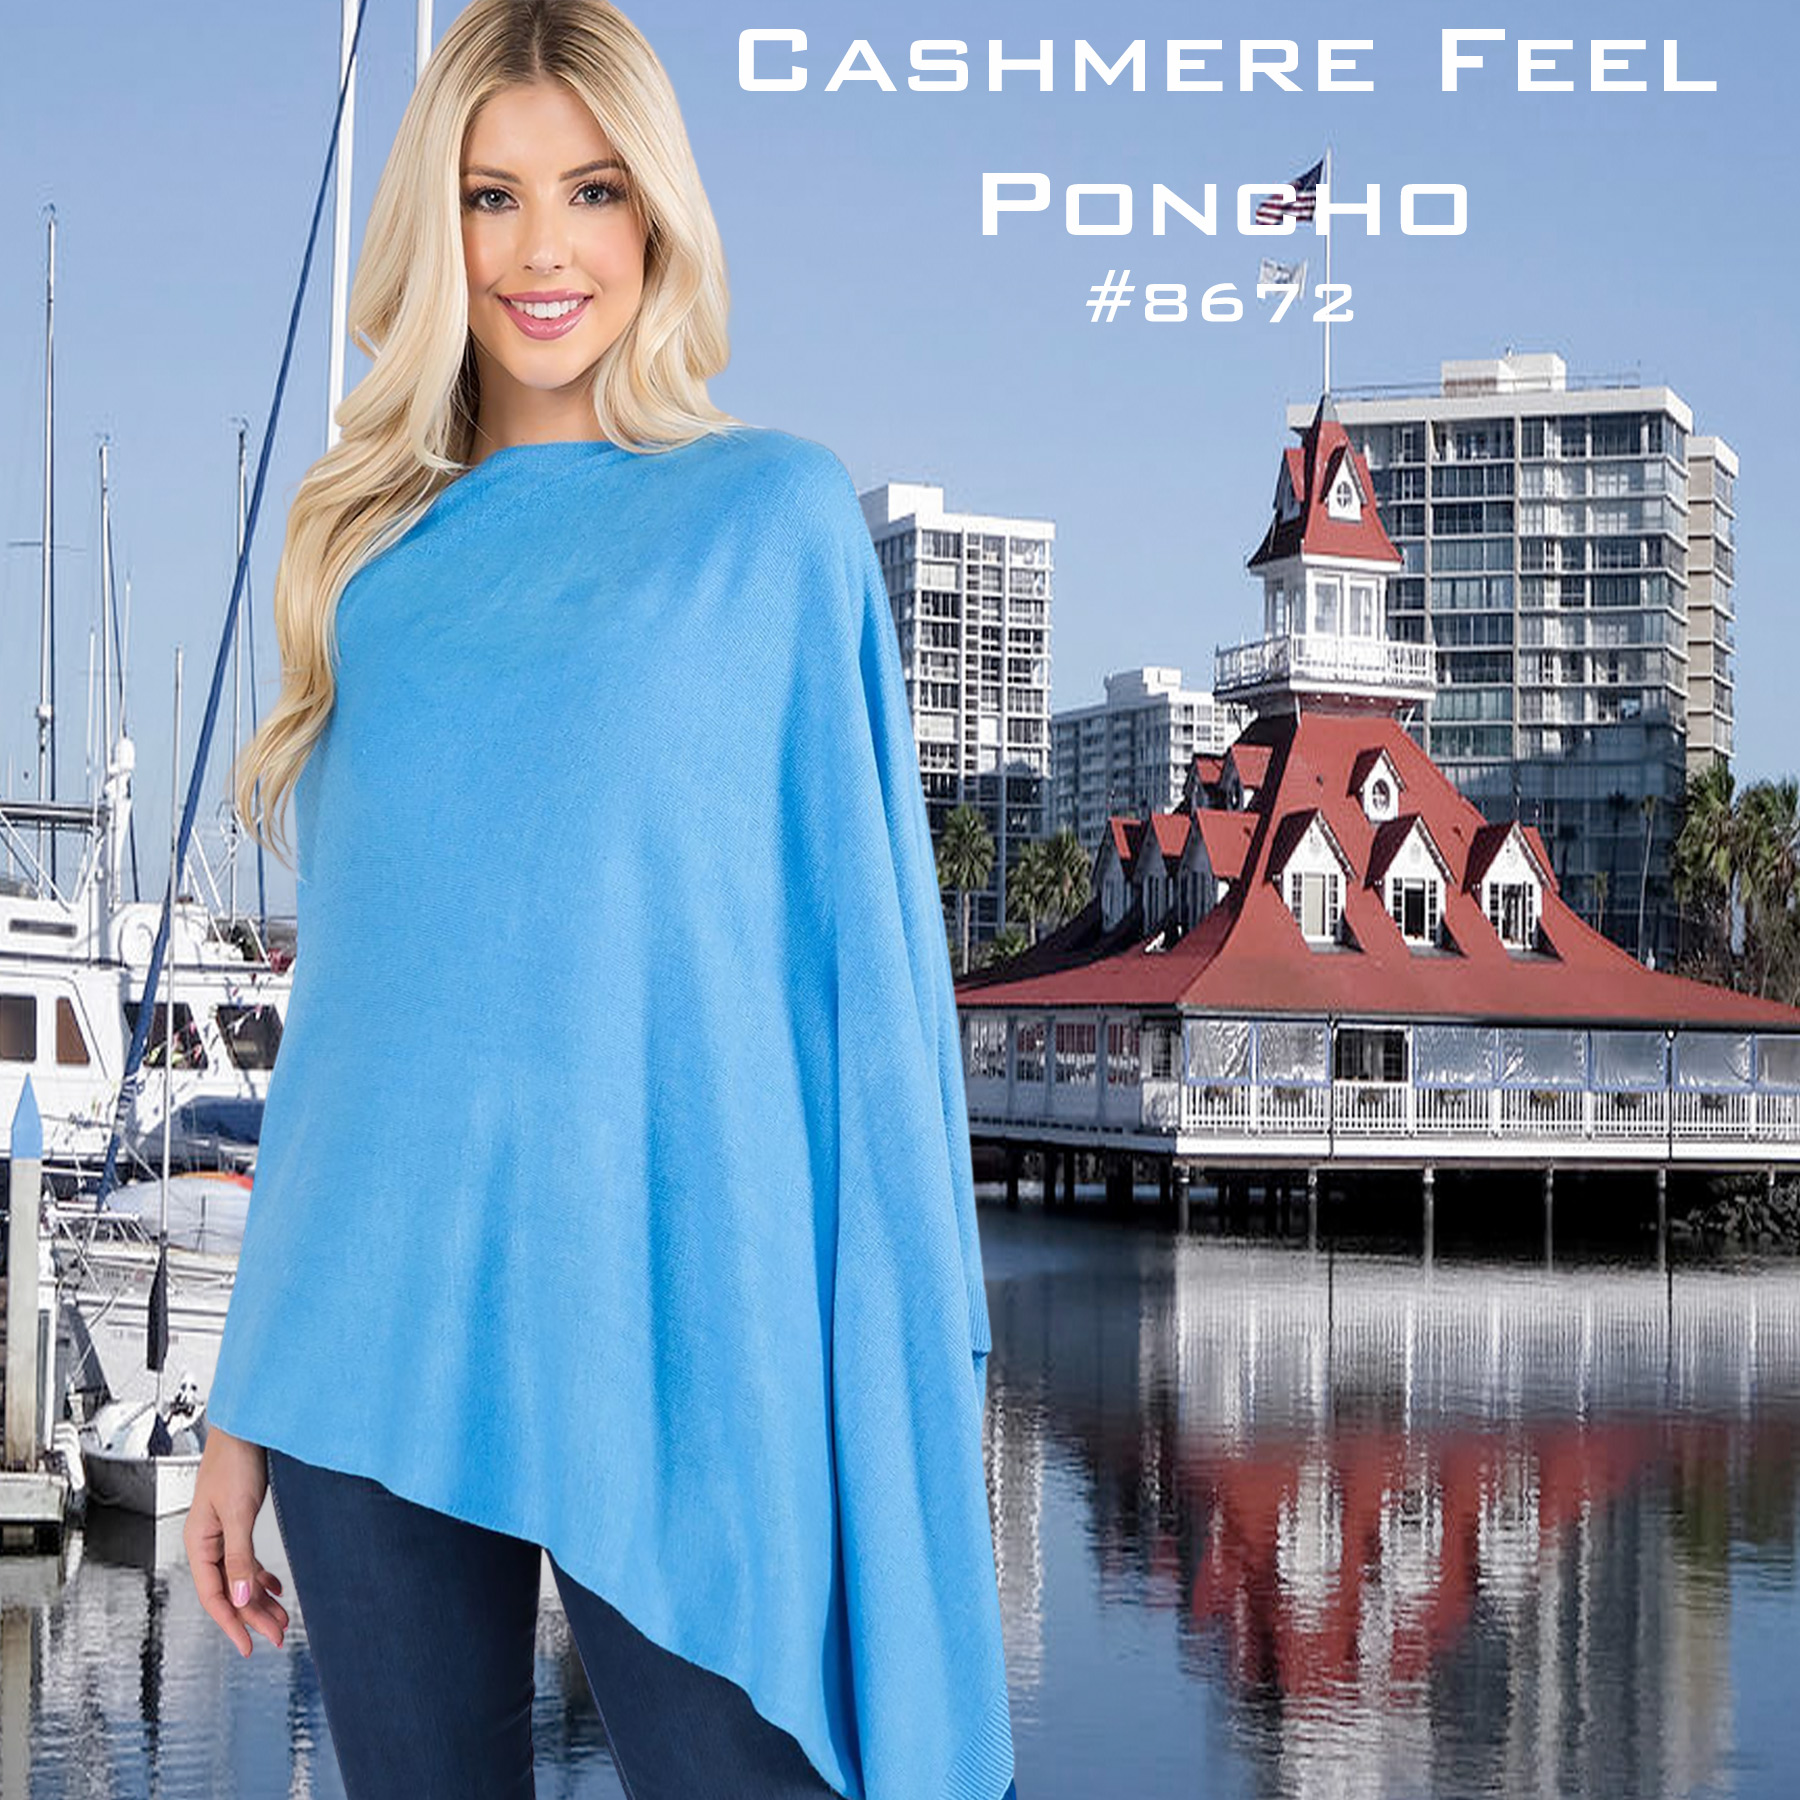 Cashmere Feel Ponchos 8672